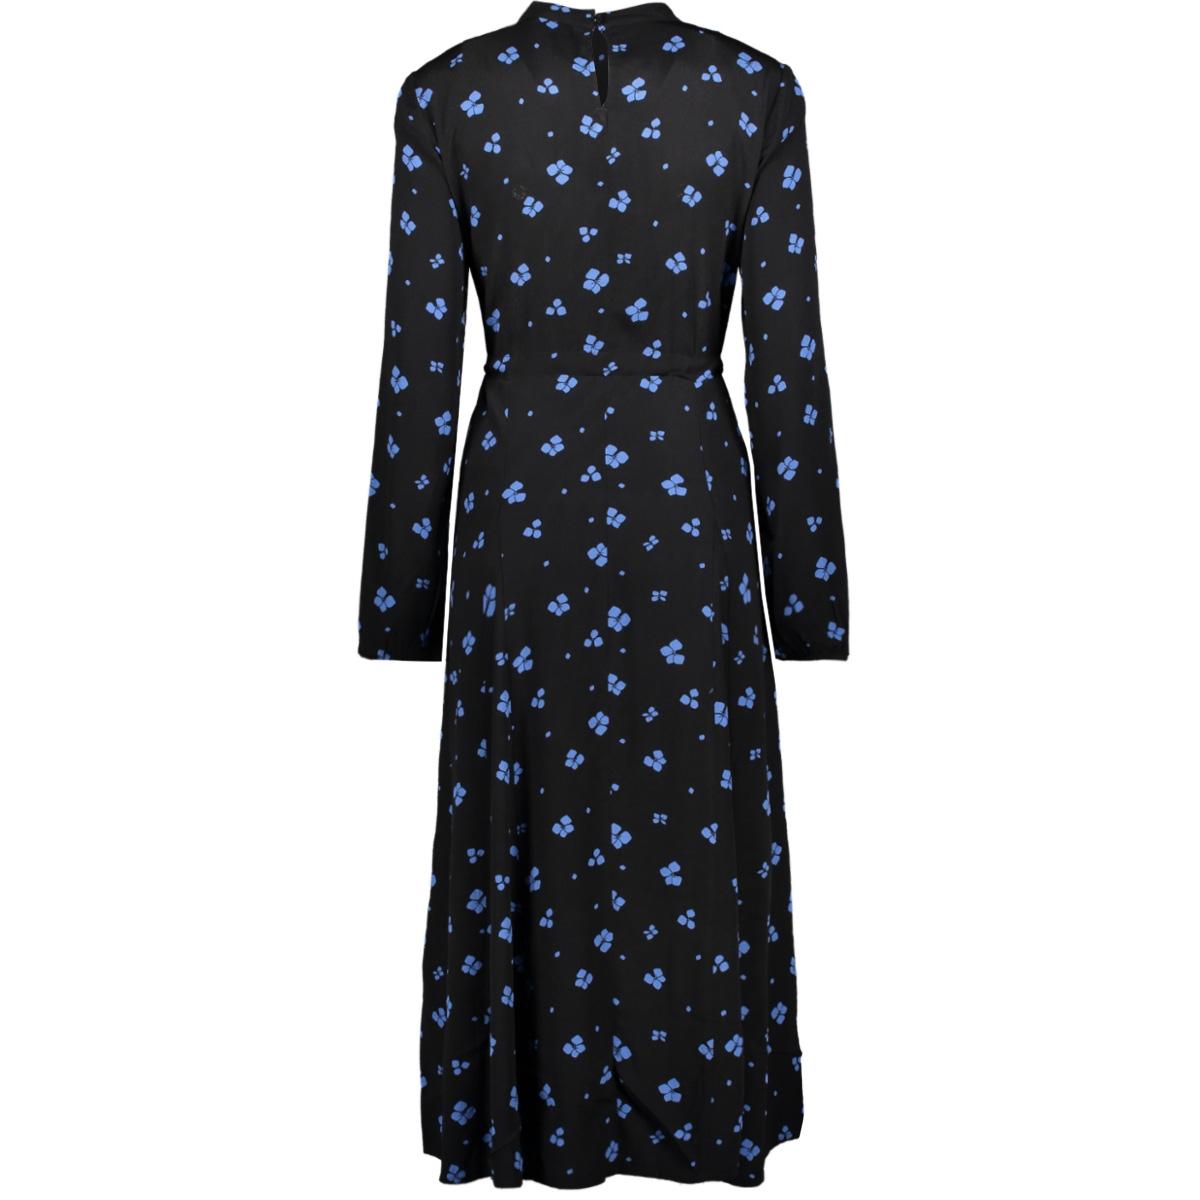 jurk met bloemenprint 1017037xx71 tom tailor jurk 21579